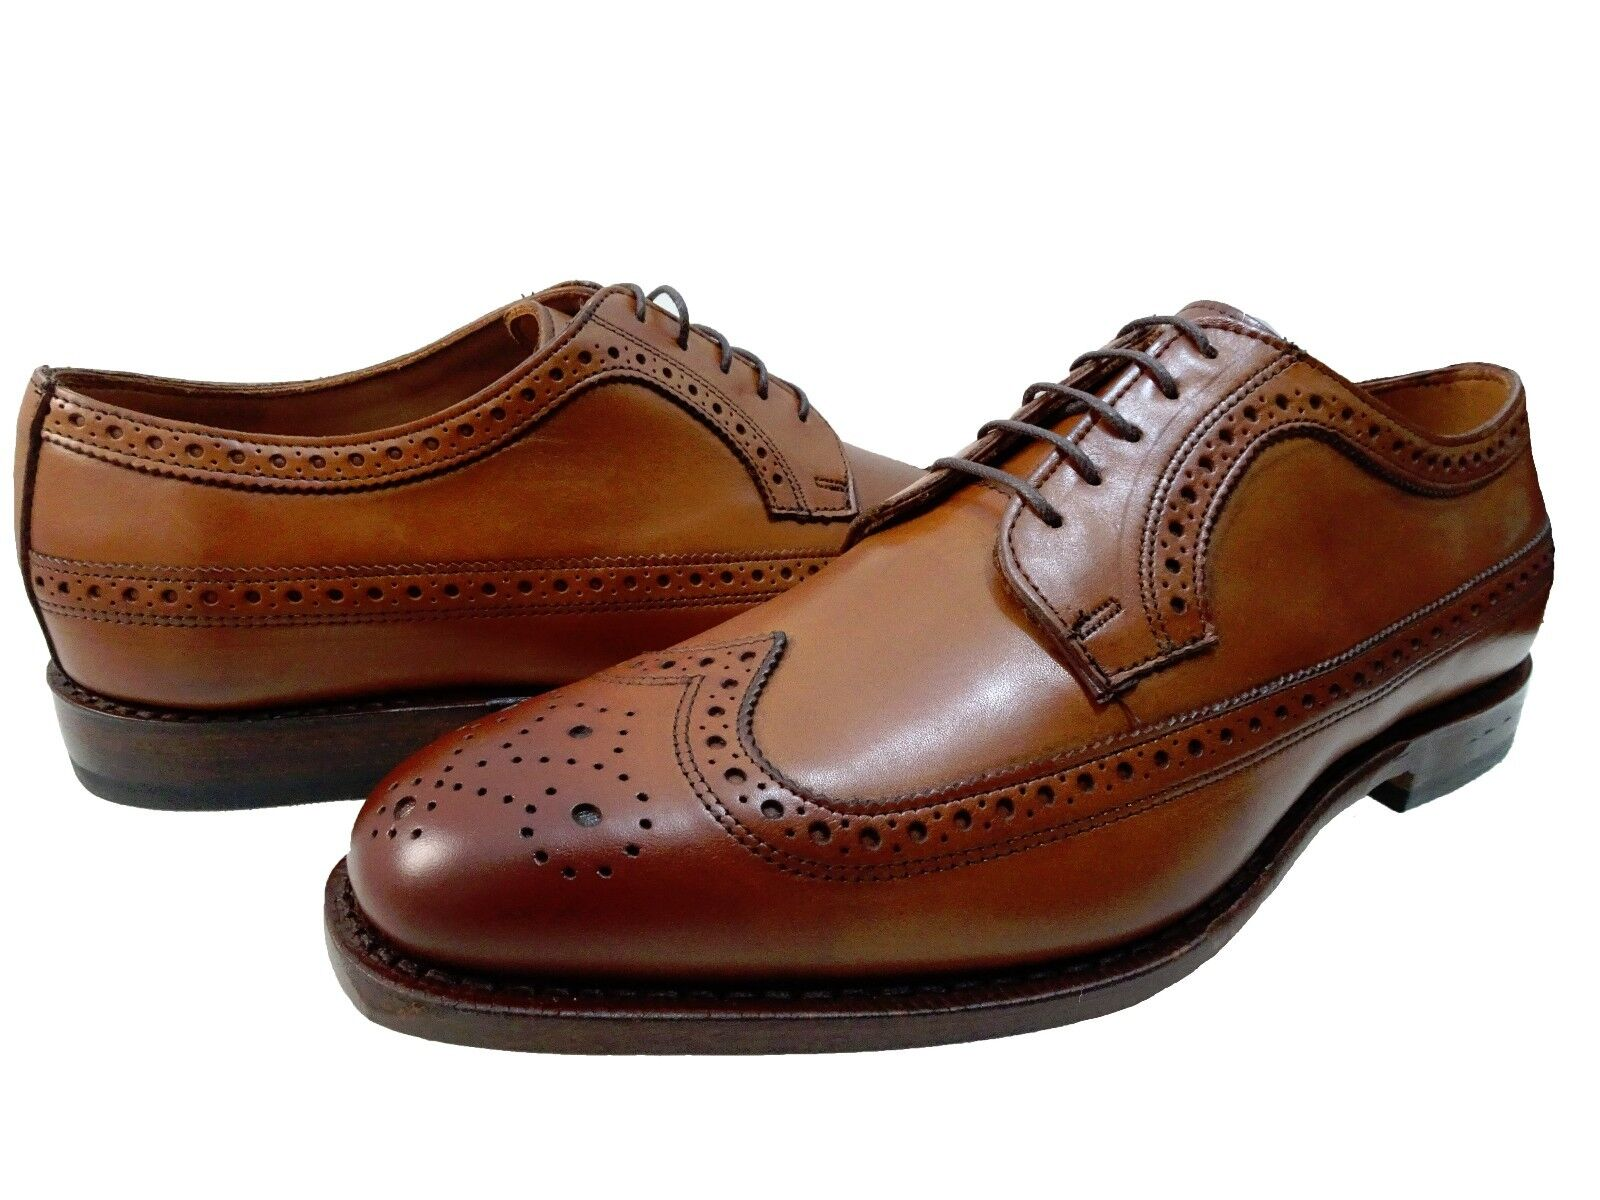 Allen Edmonds Mens Leiden Lace Up Brogue Wingtip Perforated Business Dress shoes